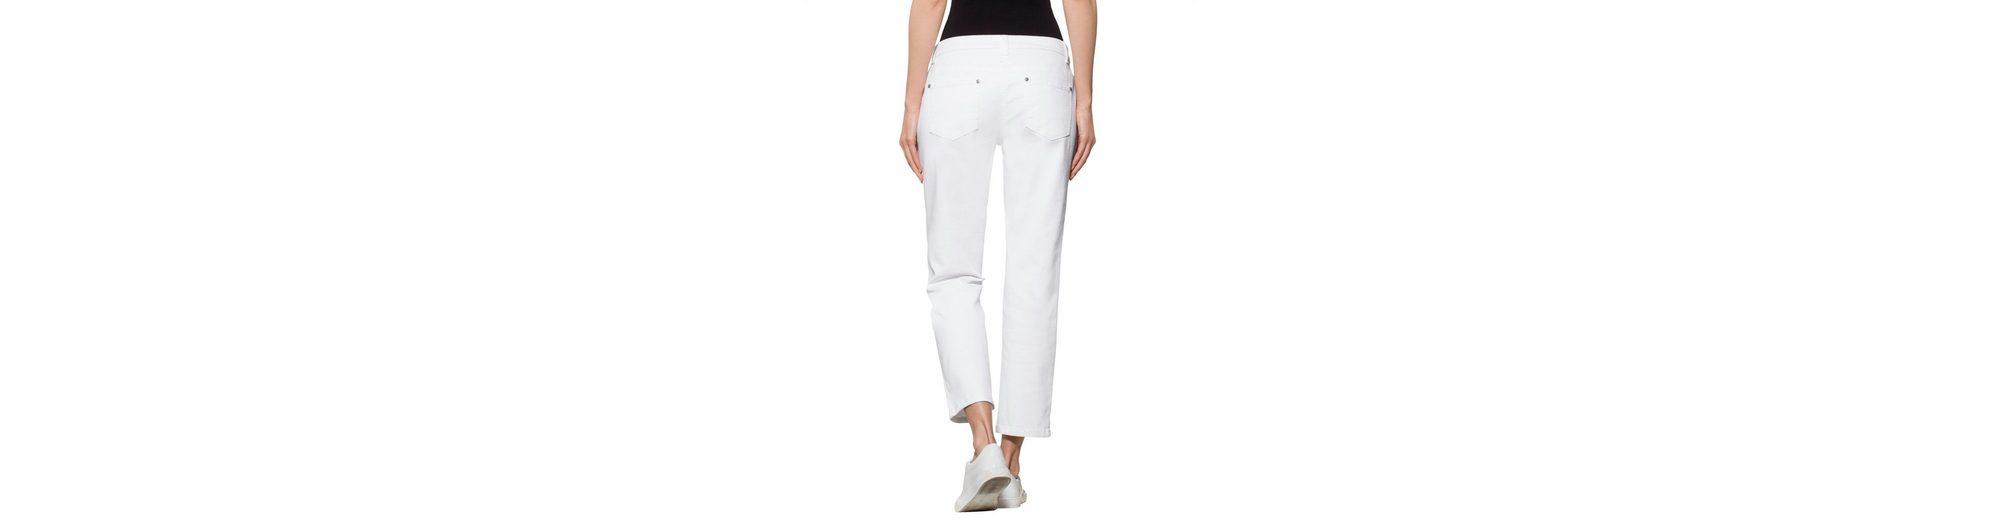 Alba Moda Jeans im Boyfriend-Style Große Diskont Online mrBFHTH43